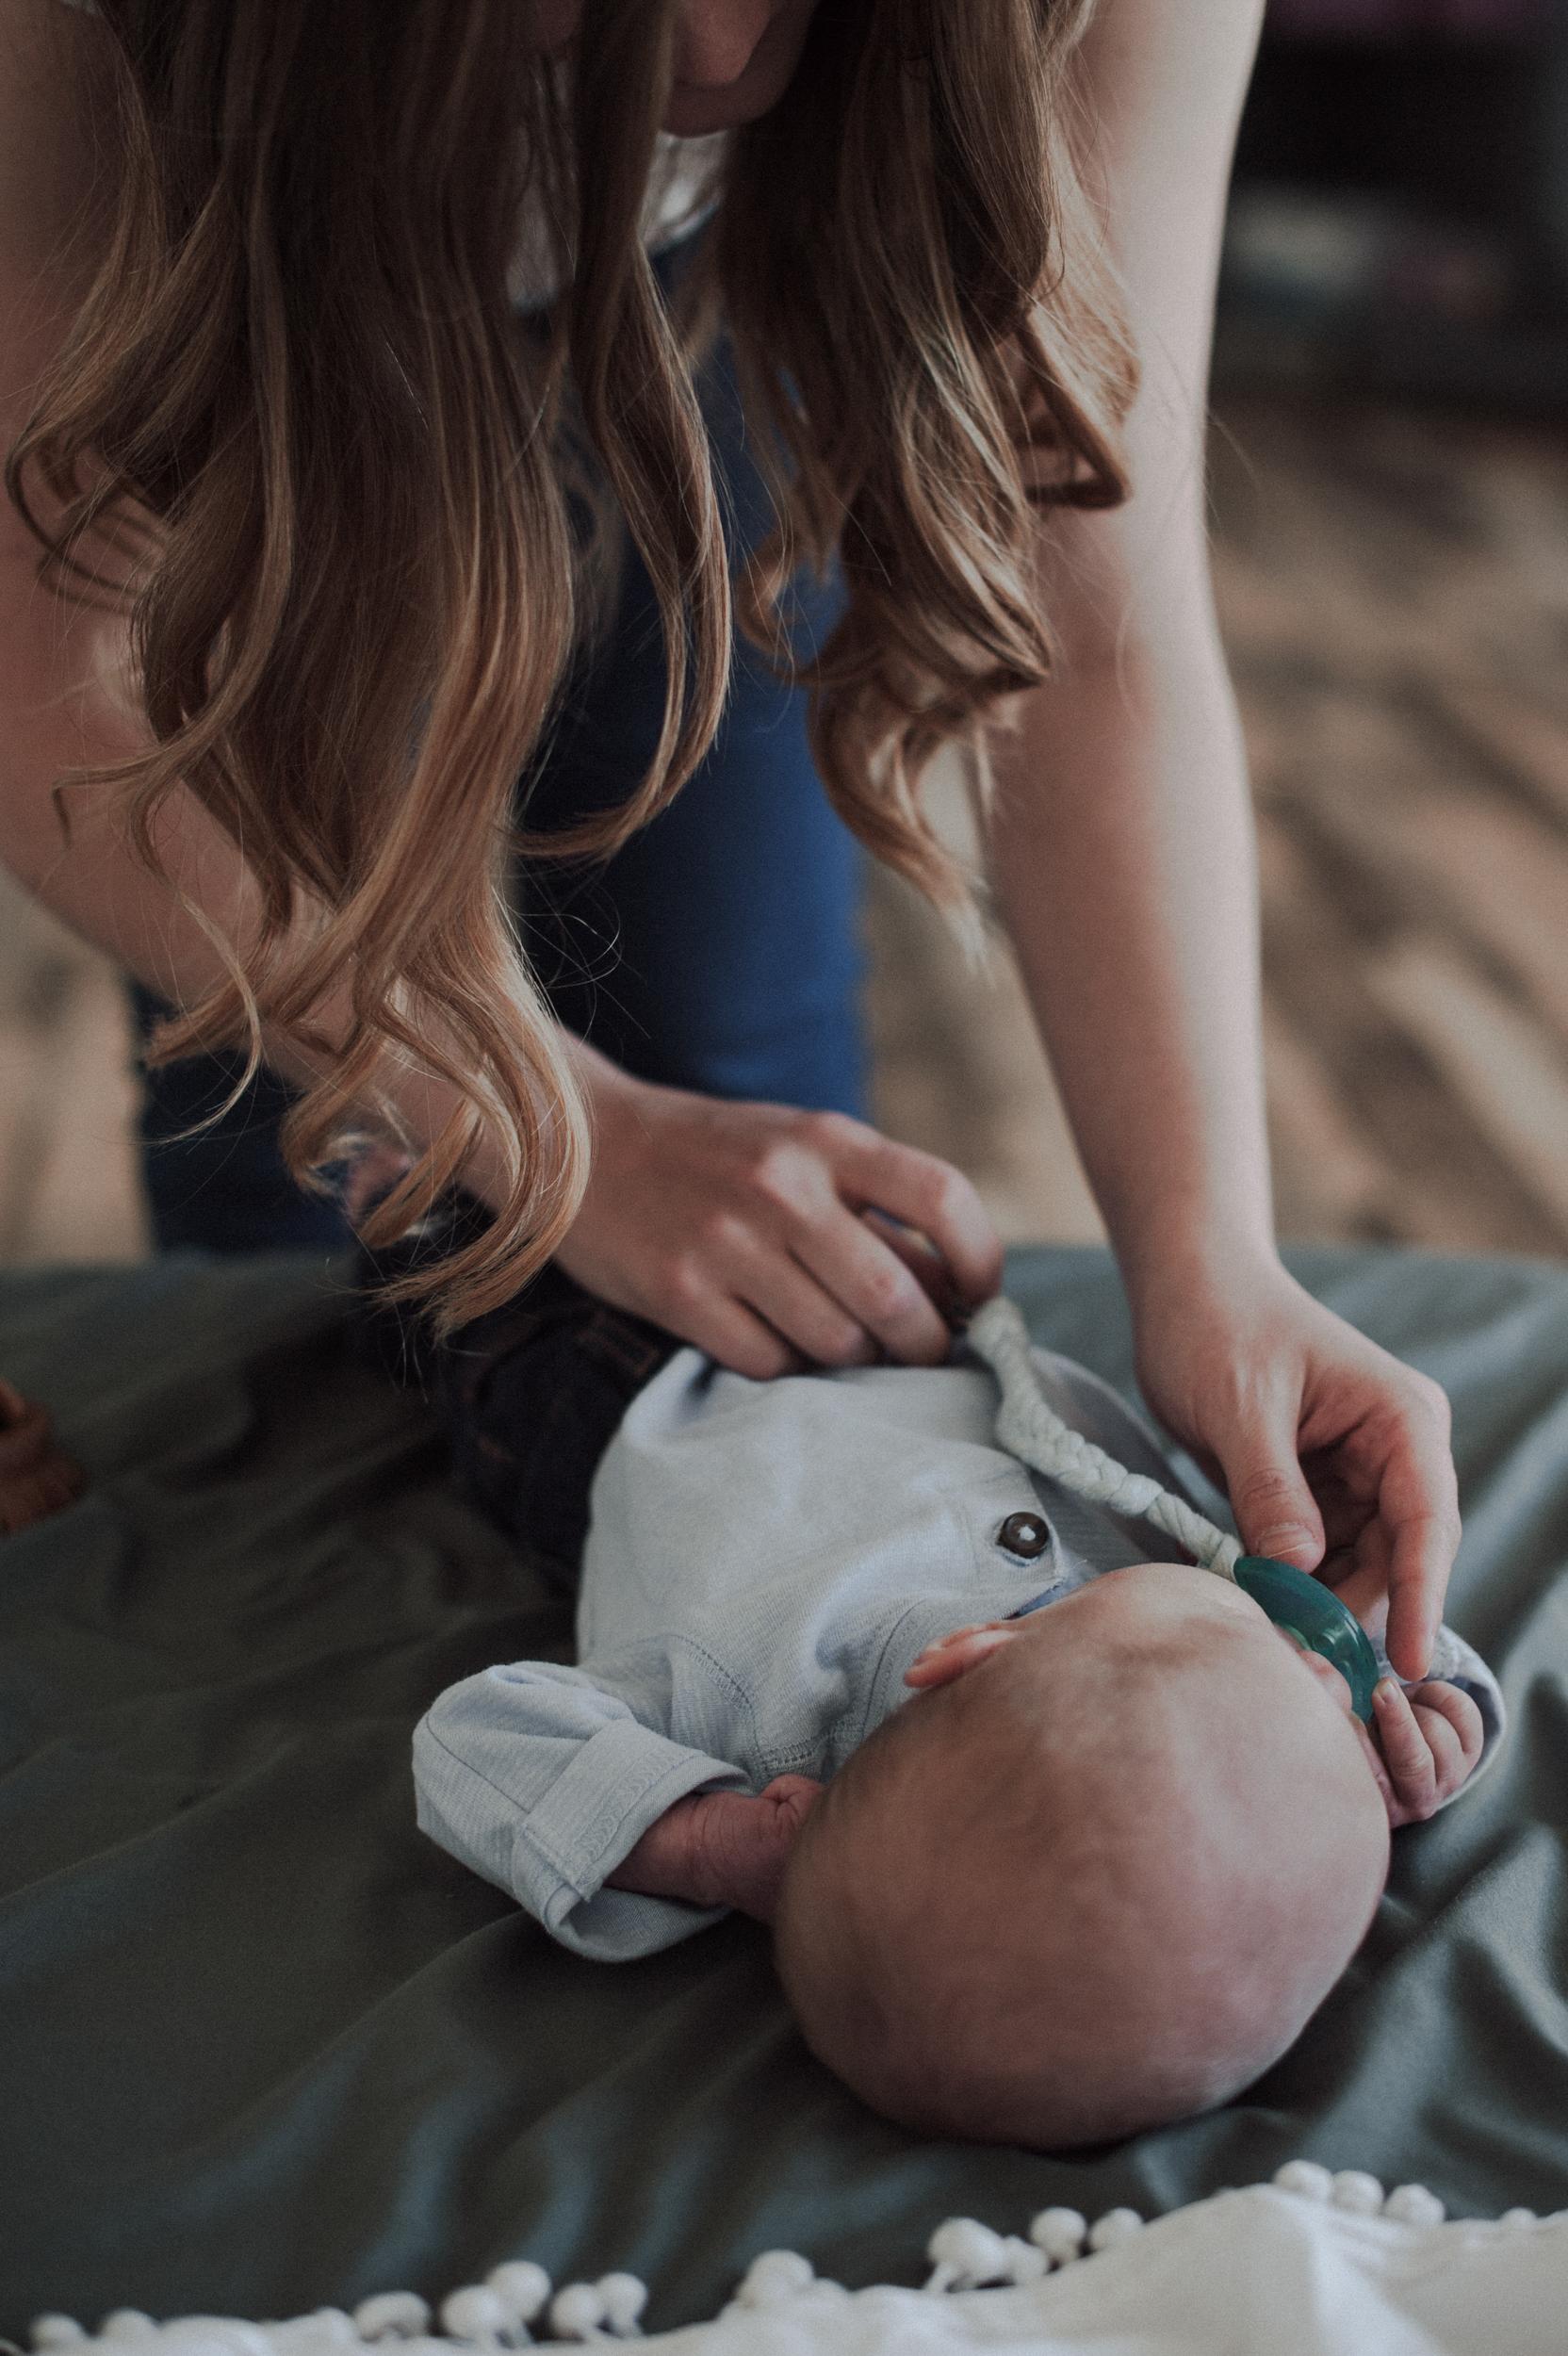 Mom dressing baby boy giving him binky